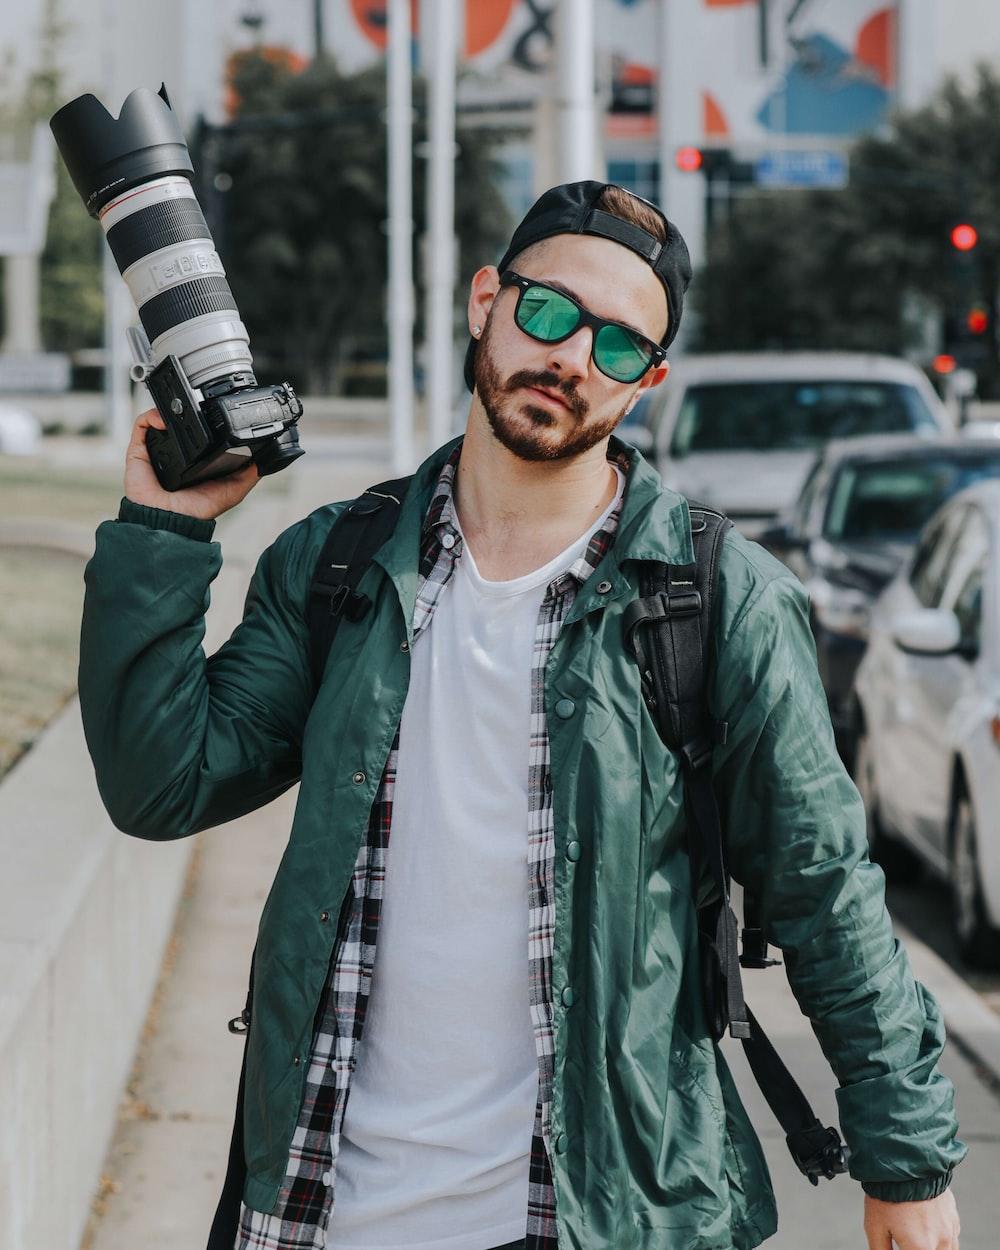 man holding DSLR camera wearing green button-up jacket beside cars